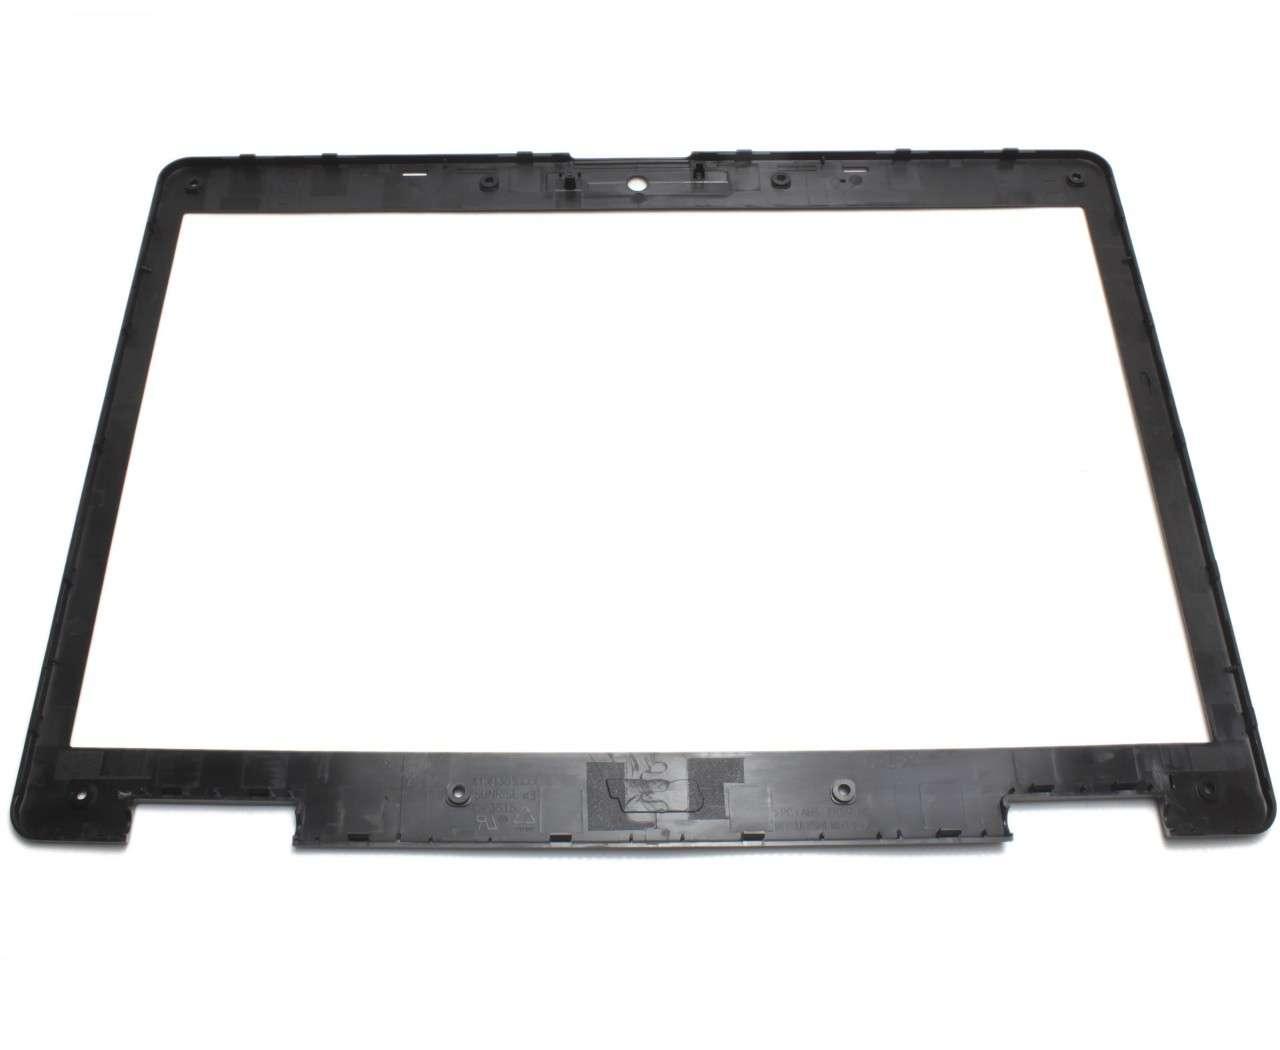 Rama Display Acer TravelMate 5520g Bezel Front Cover Neagra imagine